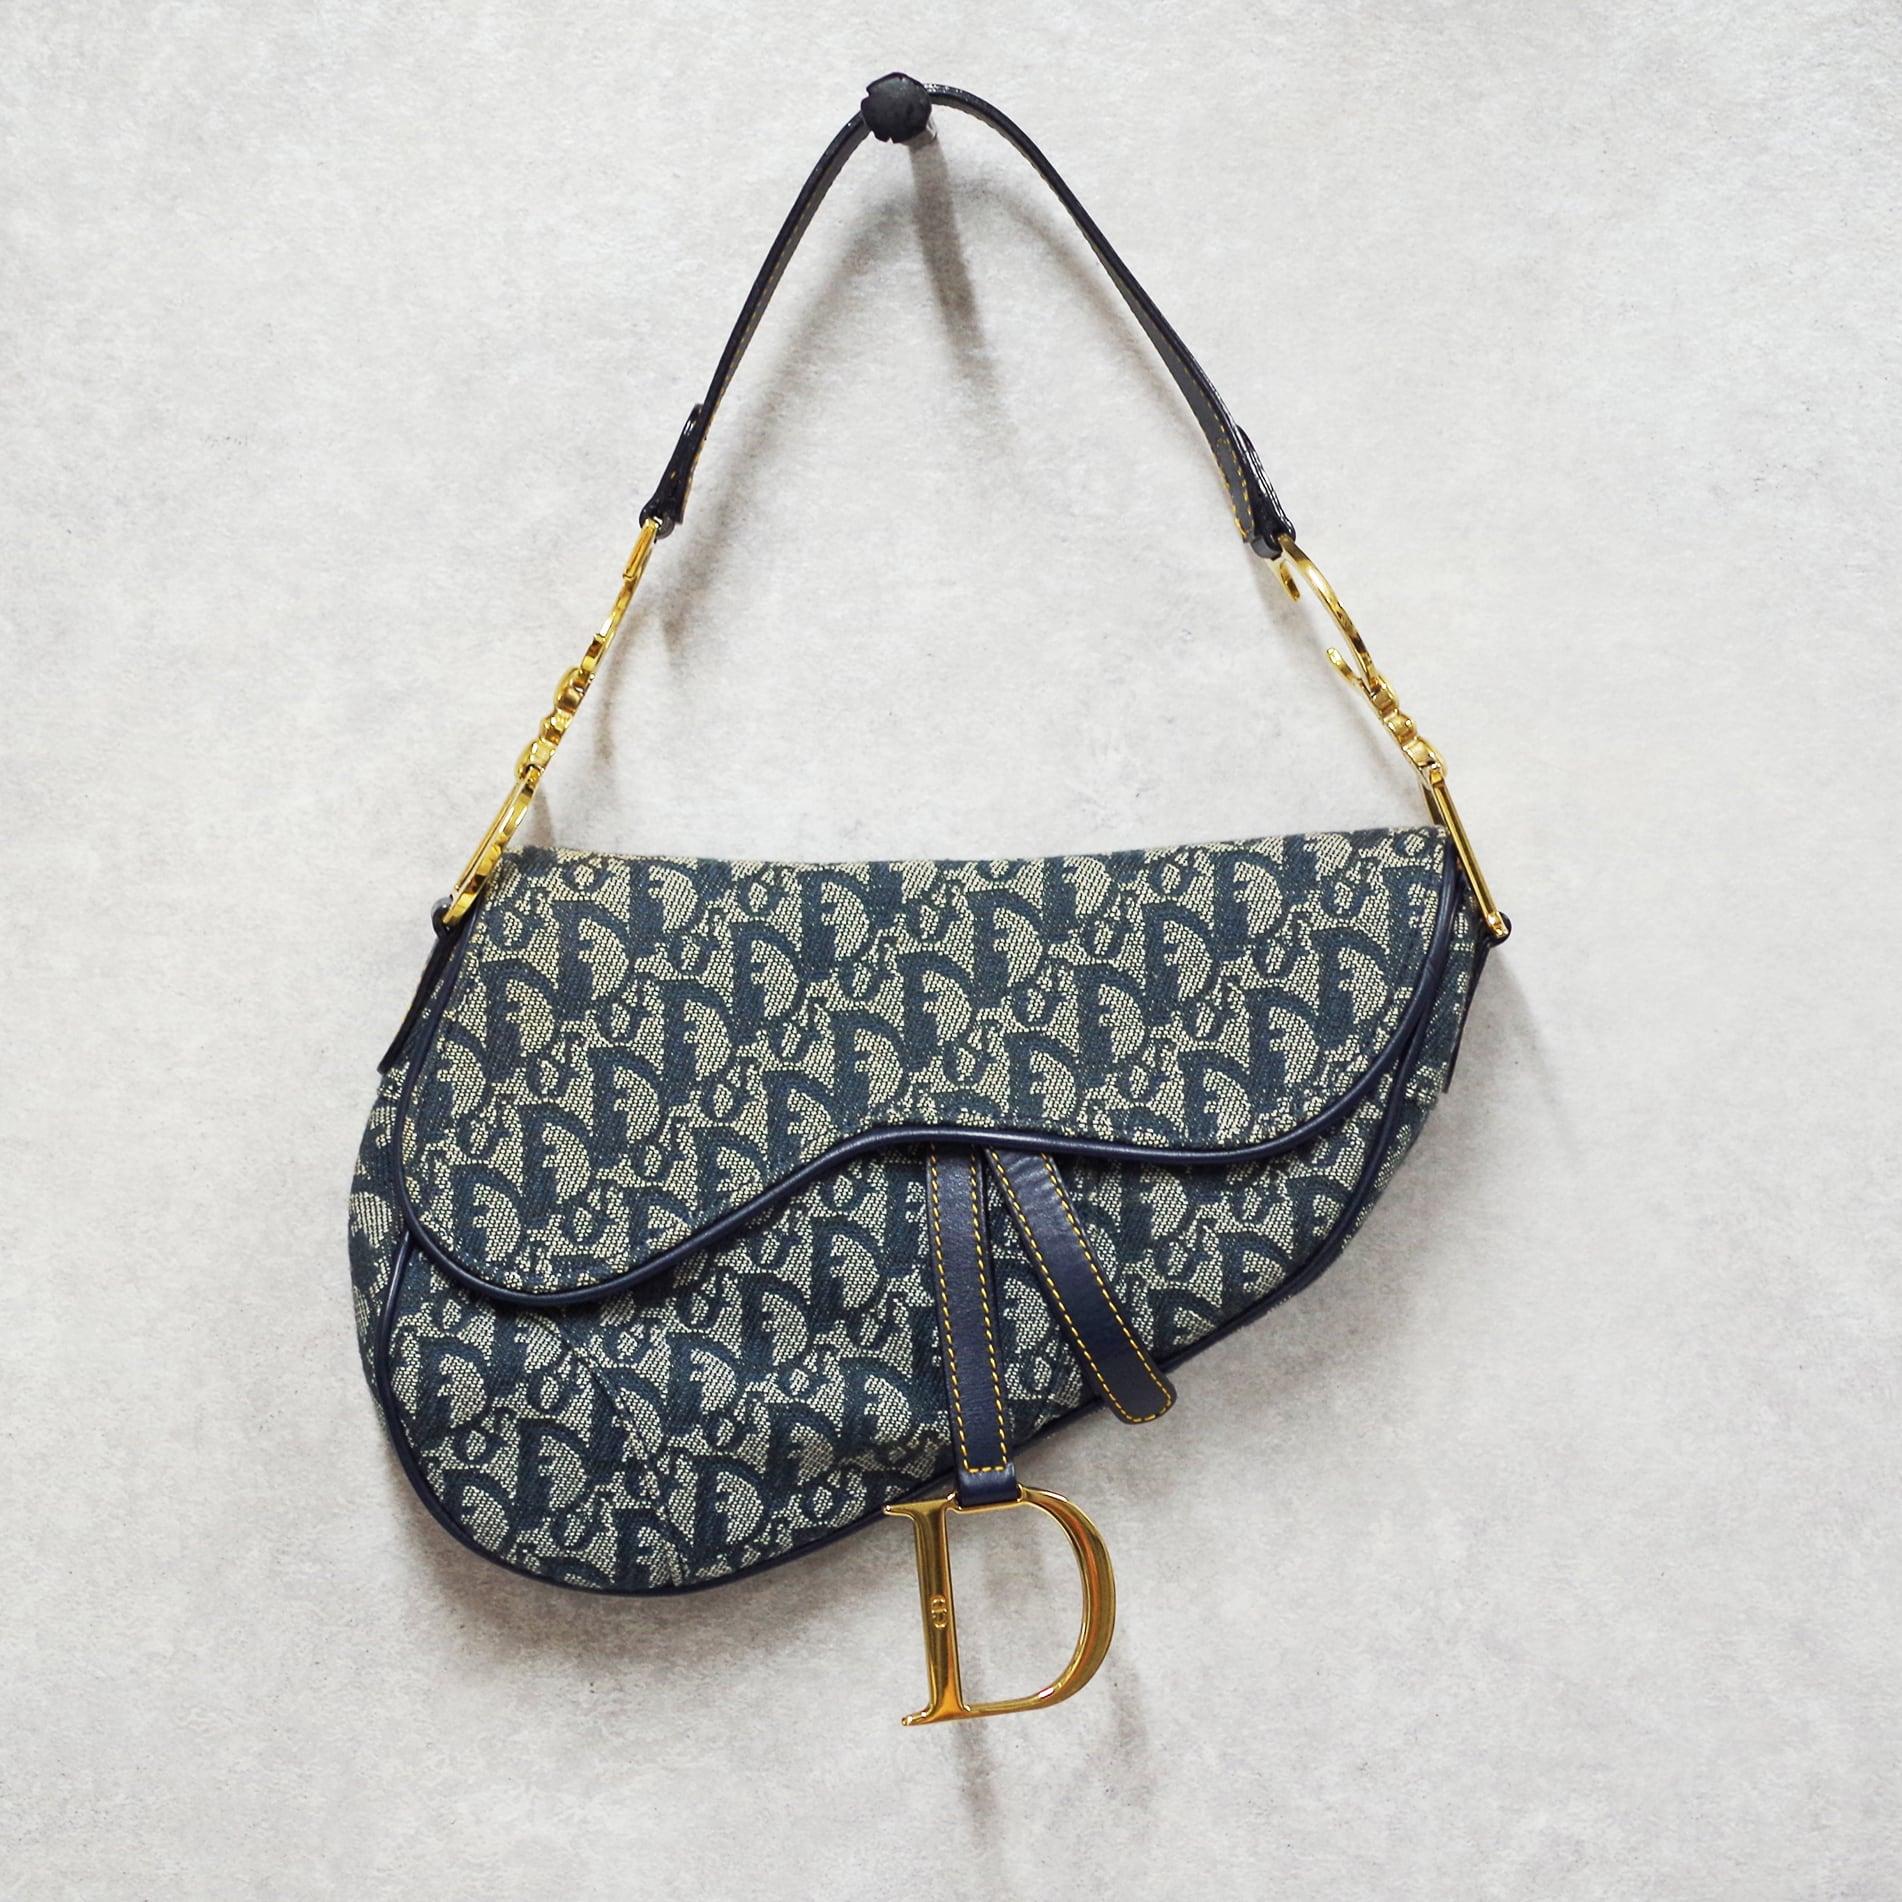 Christian Dior ディオール オブリーク トロッター サドルバッグ ブルー ジャガードキャンバス レザー